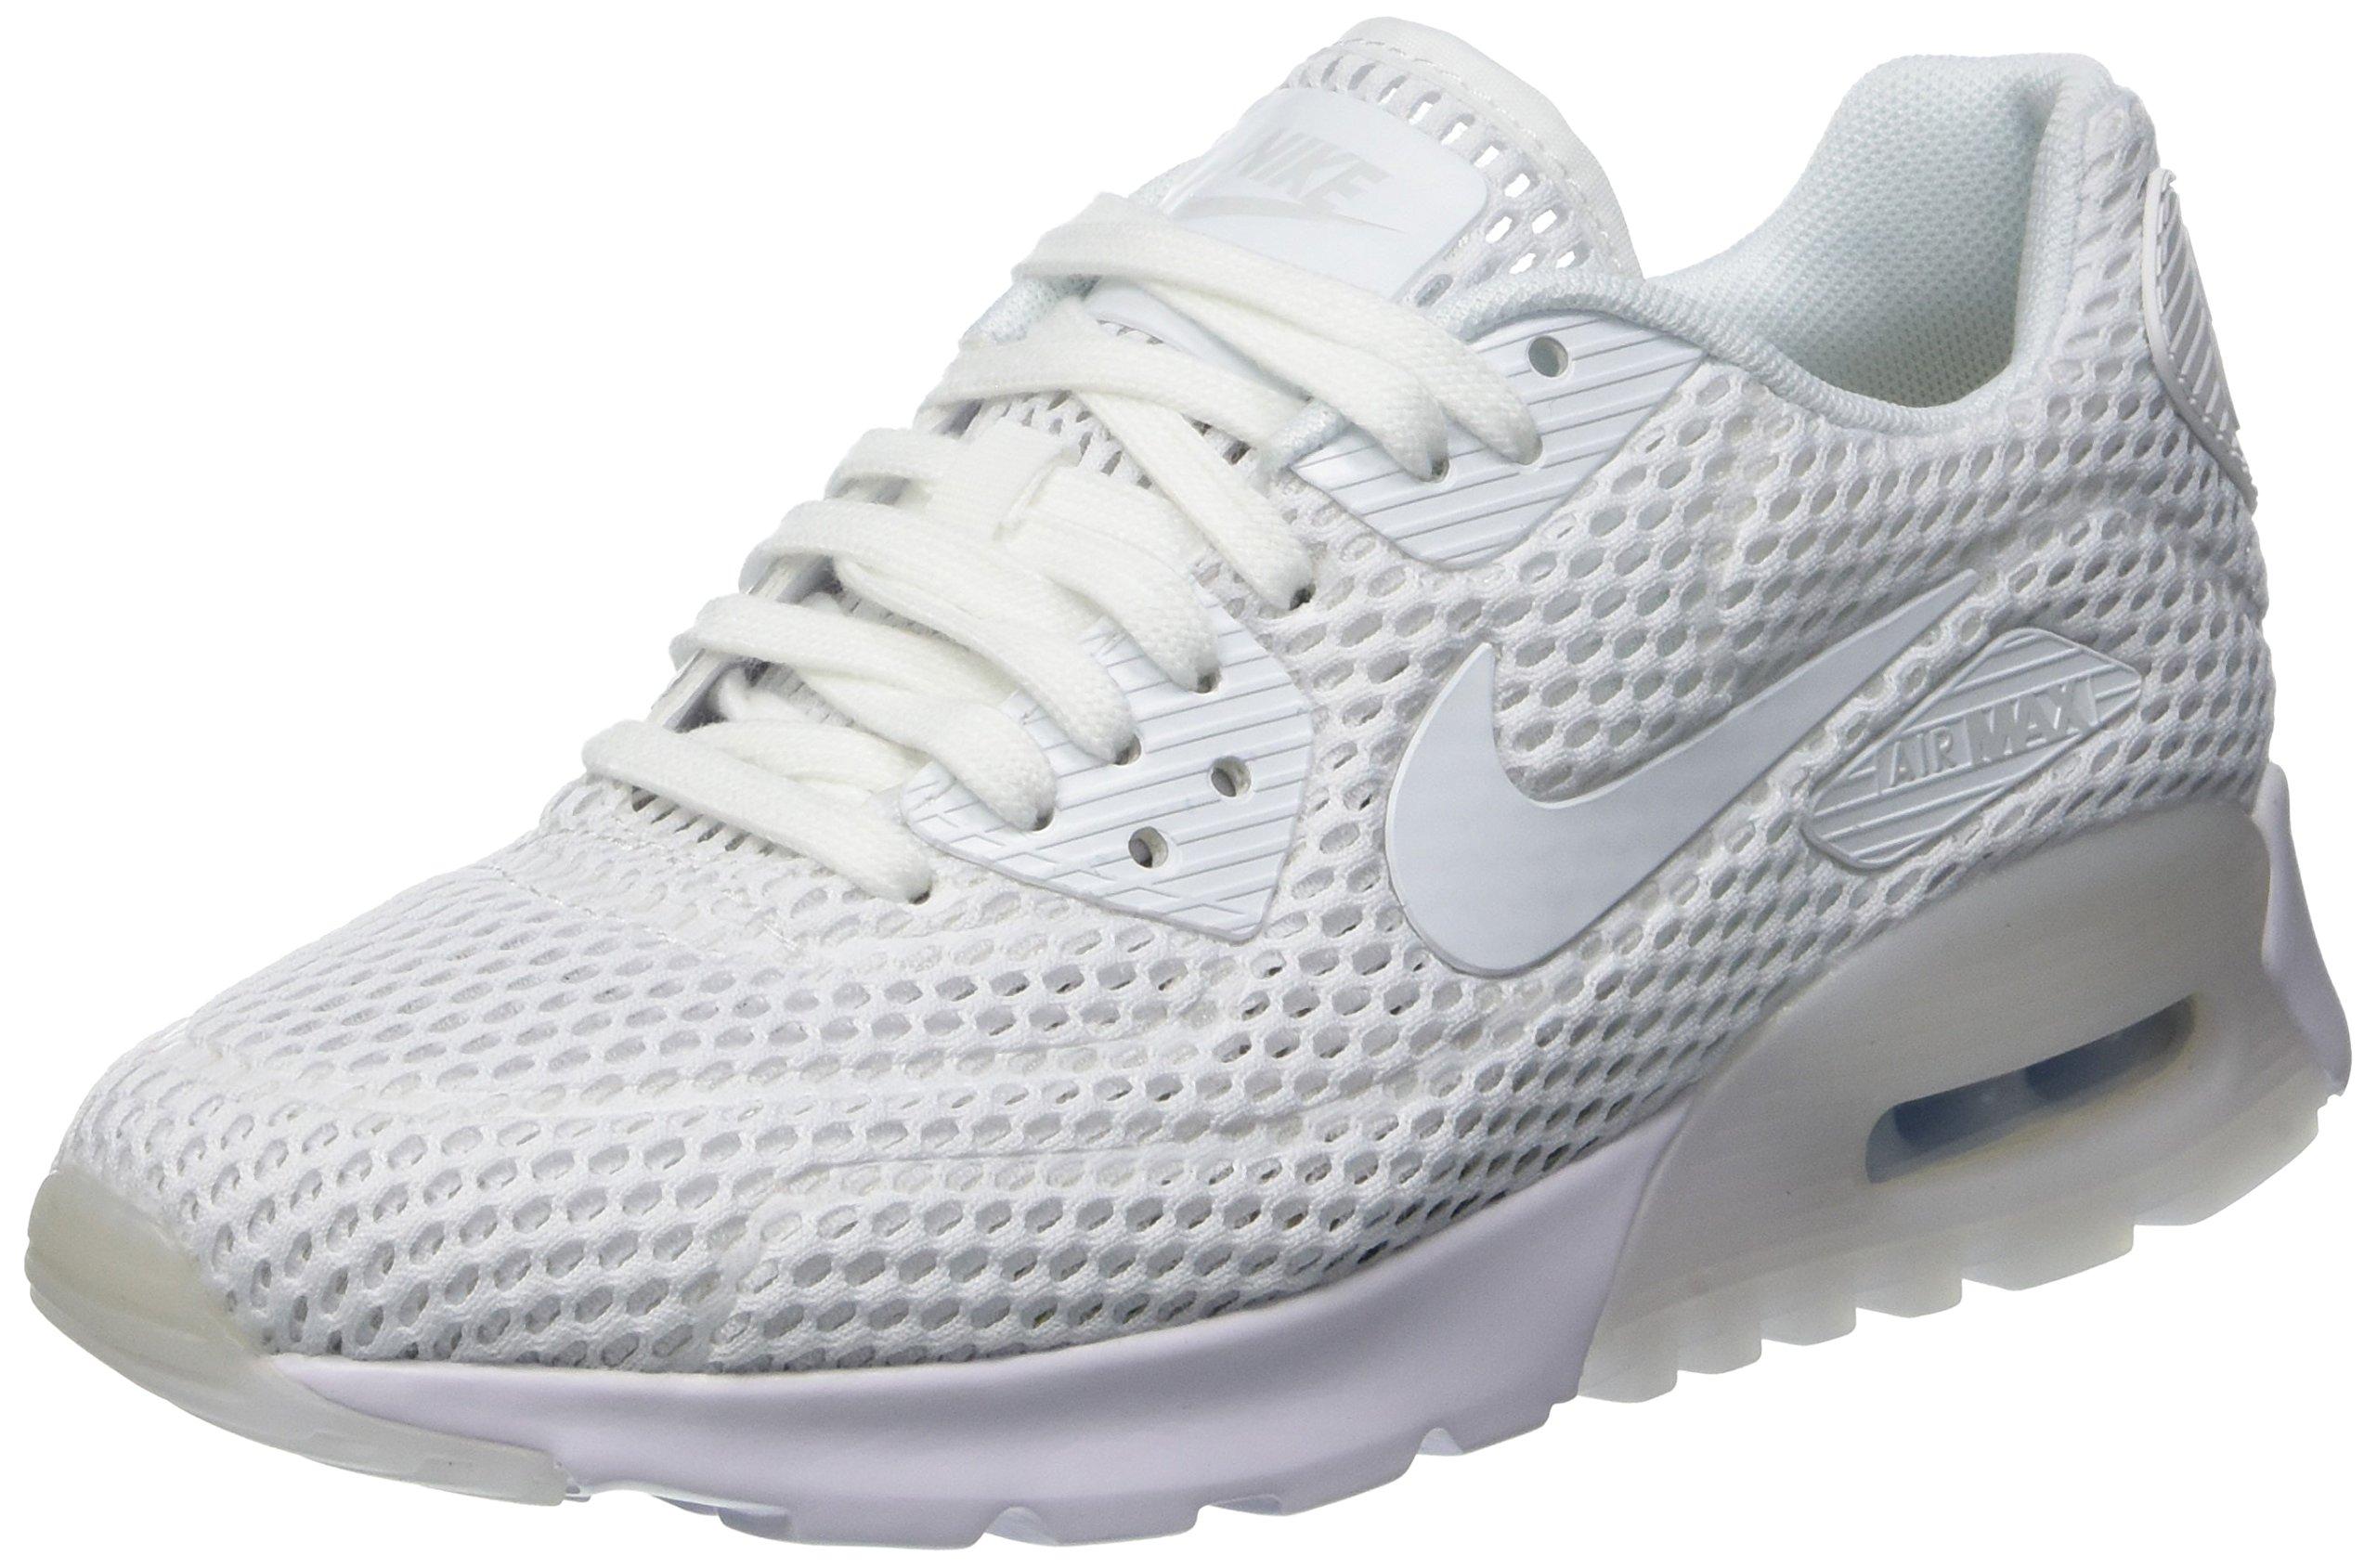 1c3e17aba99a Galleon - Nike Womens W Air Max 90 Ultra BR White Pure Platinum Mesh  Running Shoes